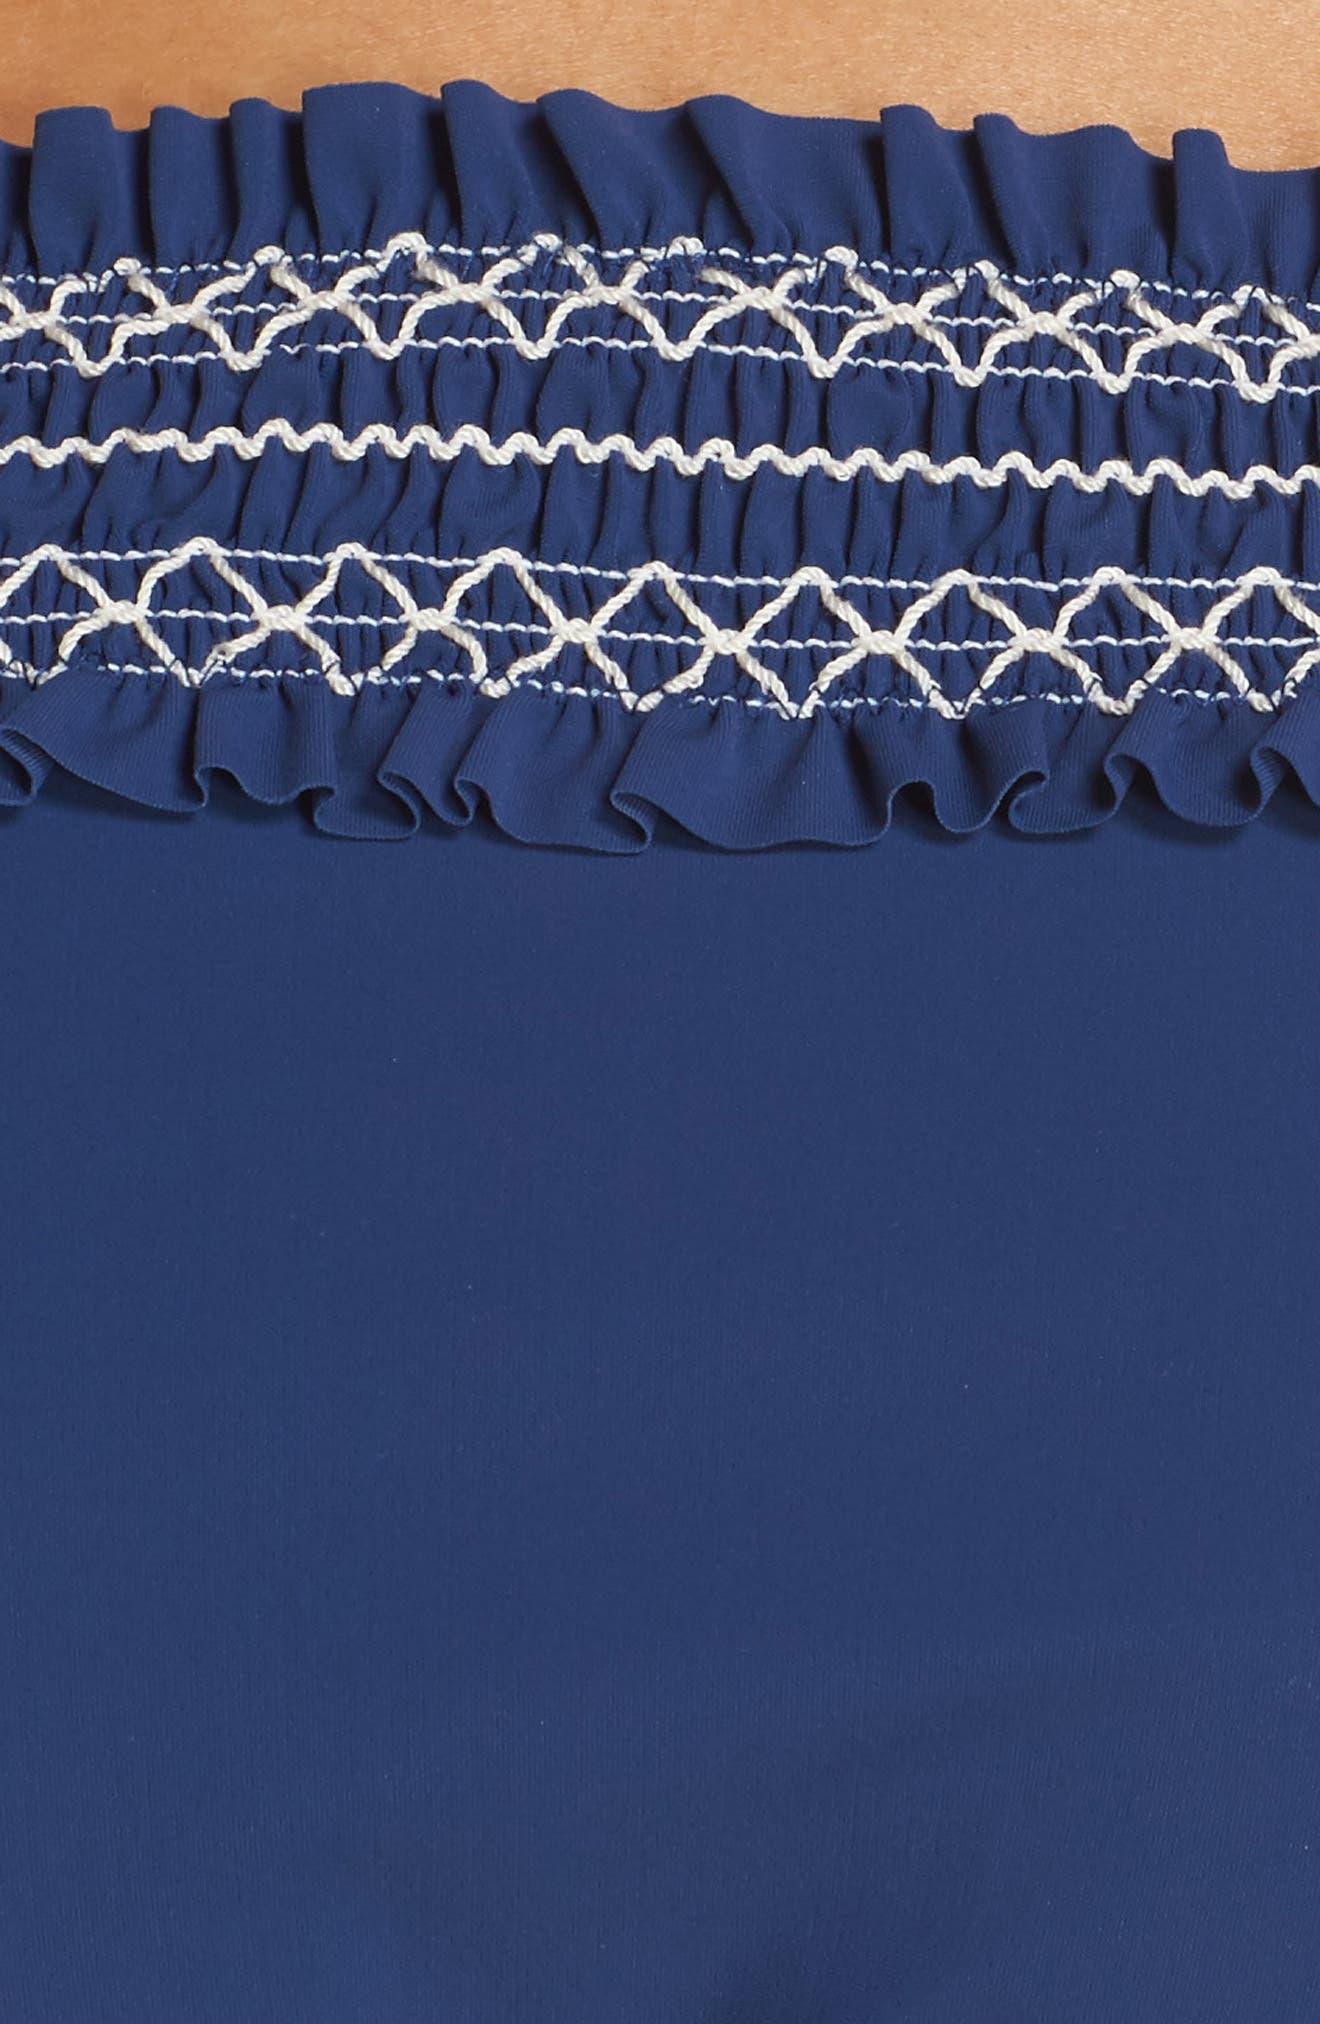 Costa Smocked Hipster Bikini Bottoms,                             Alternate thumbnail 5, color,                             Capri Blue/ New Ivory